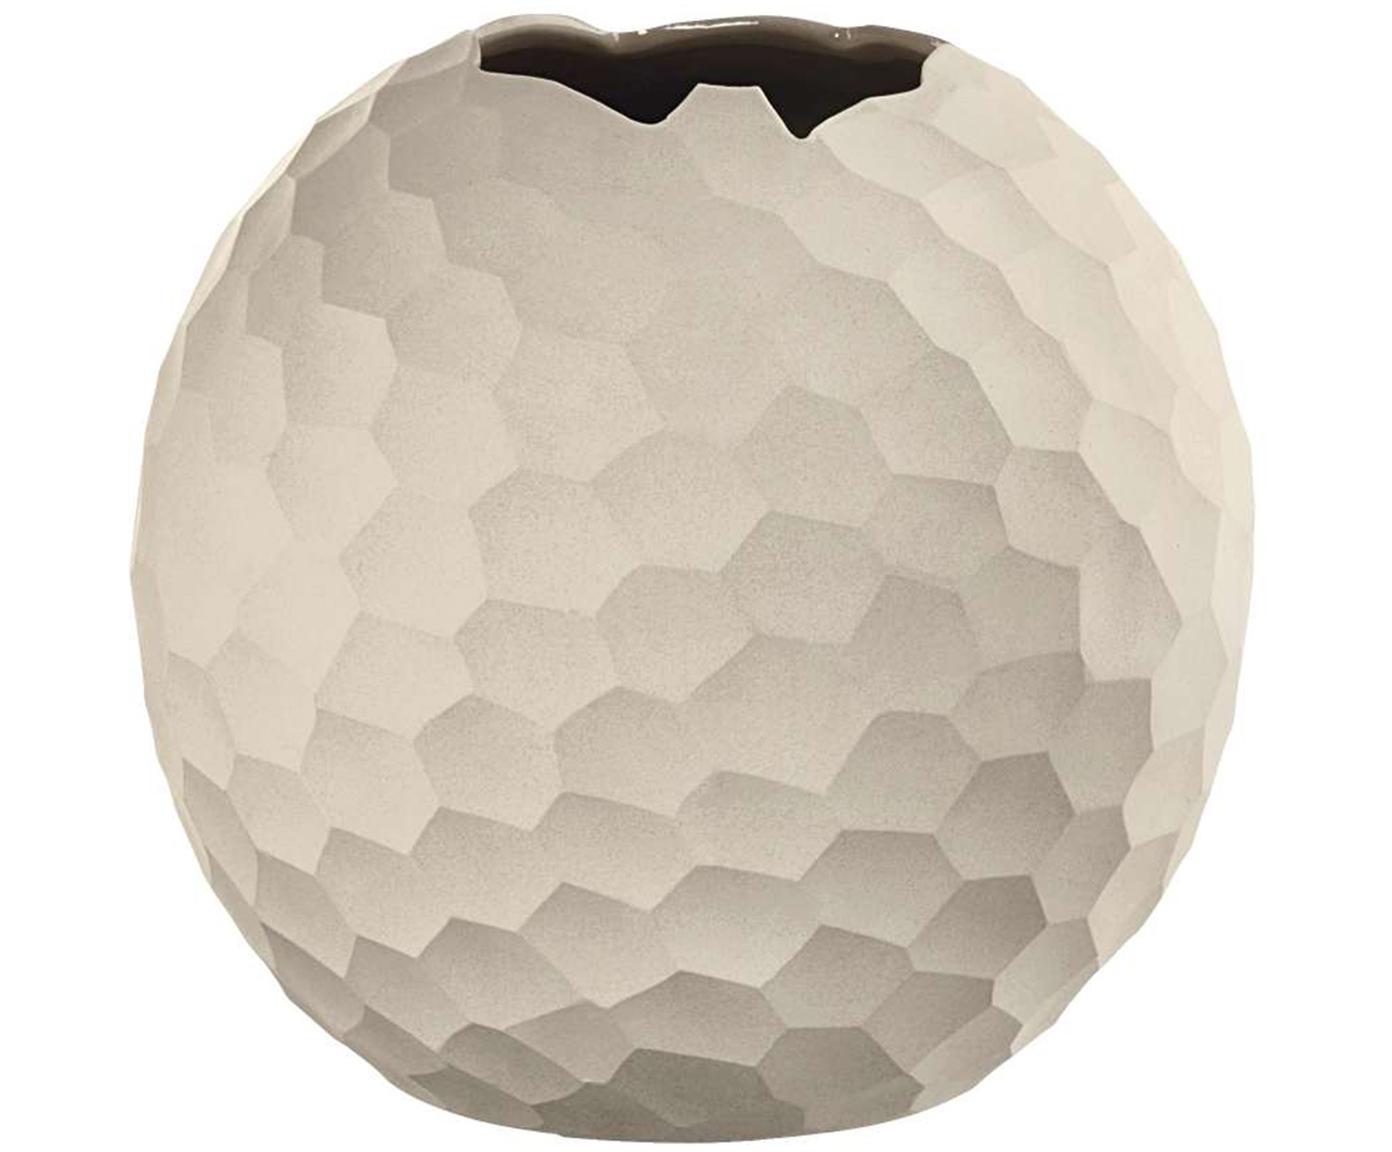 Handgemaakte vaas Carve, Keramiek, Lampenkap: grijs. Lampvoet: grijs. Snoer: wit, Ø 21 x H 20 cm